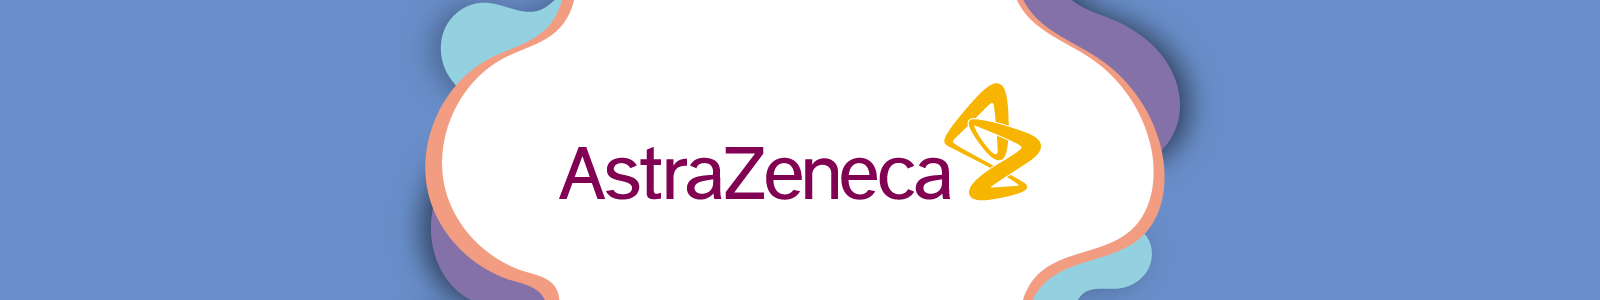 OMD-banner-site-astrazeneca